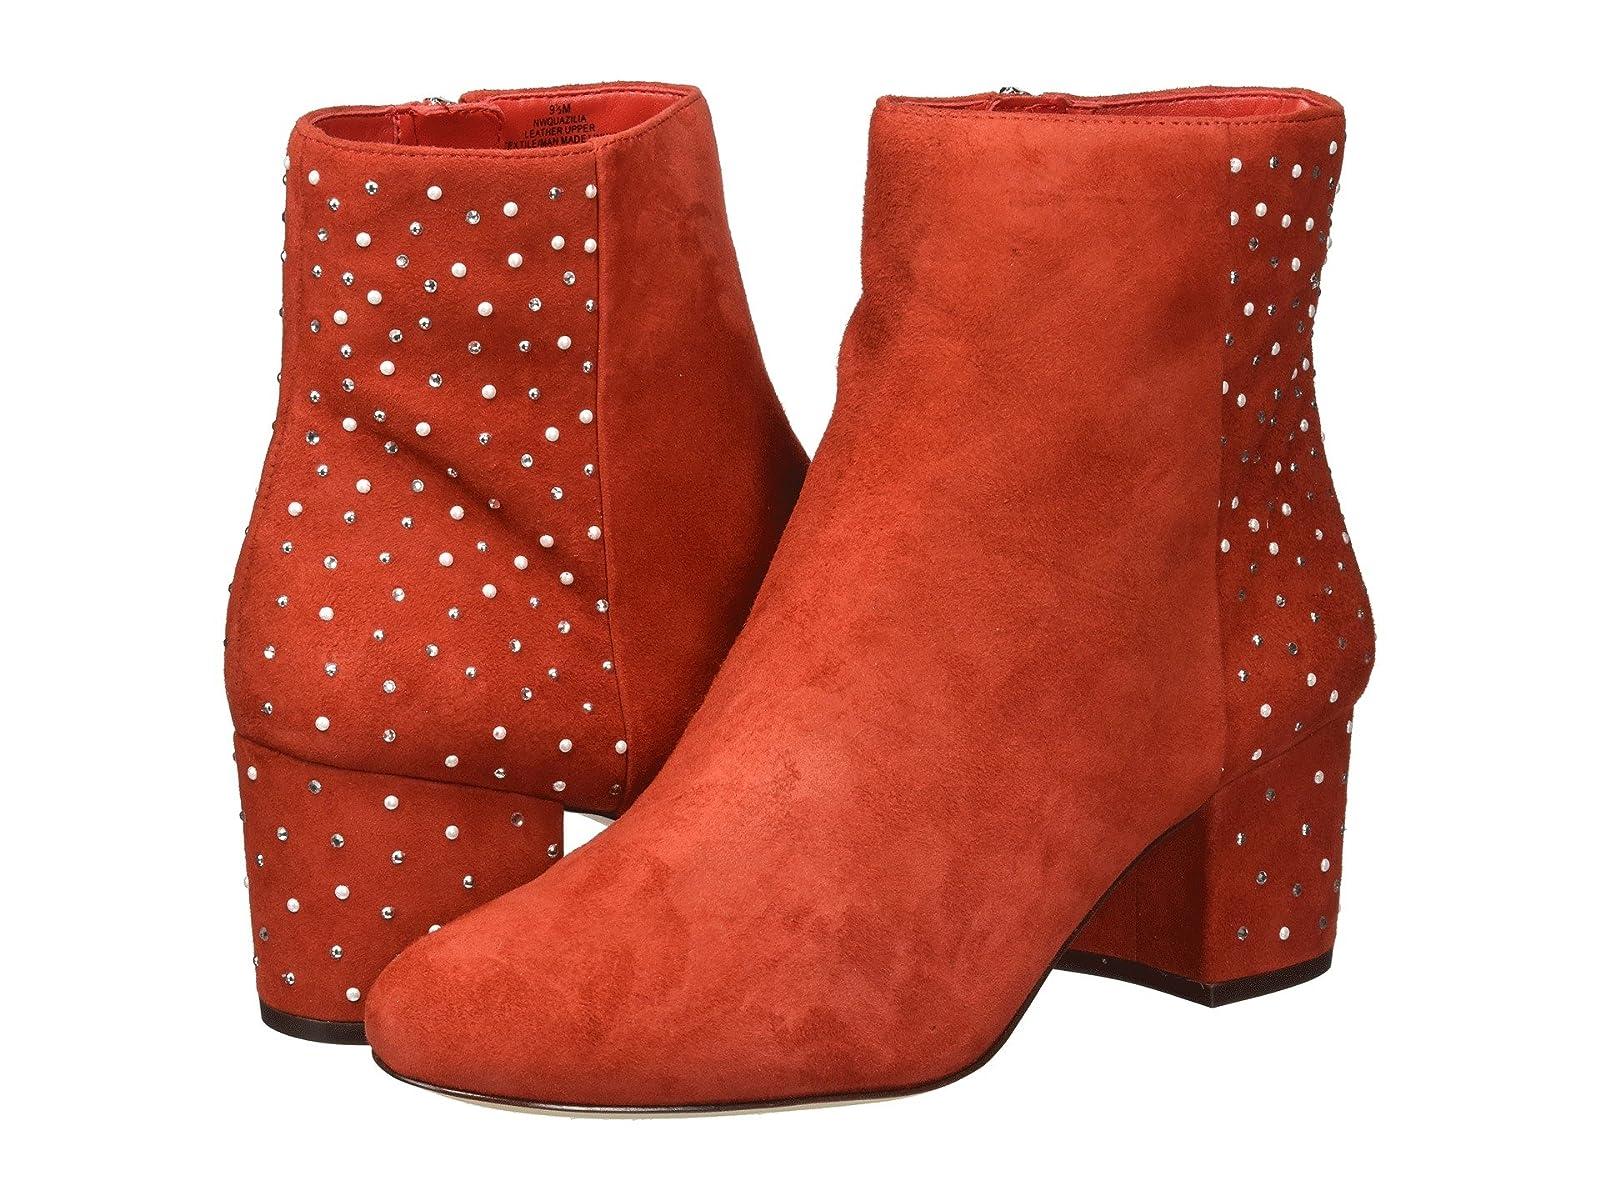 Nine West QuaziliaEconomical and quality shoes